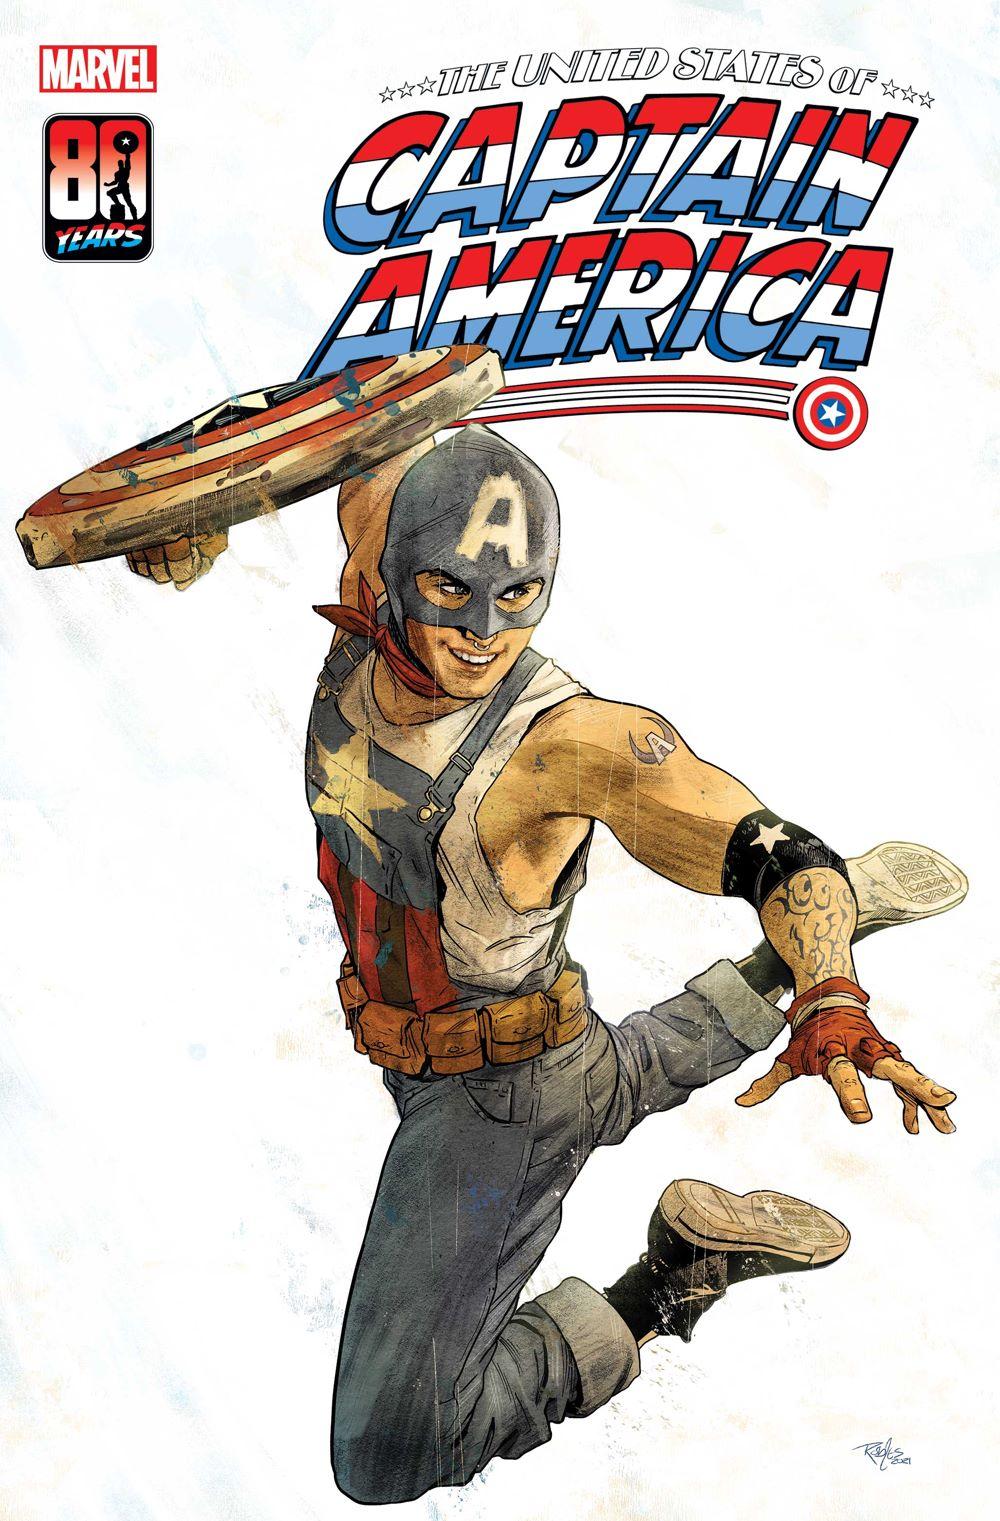 USCAPA2021001_RoblesVar-1 Marvel Comics June 2021 Solicitations